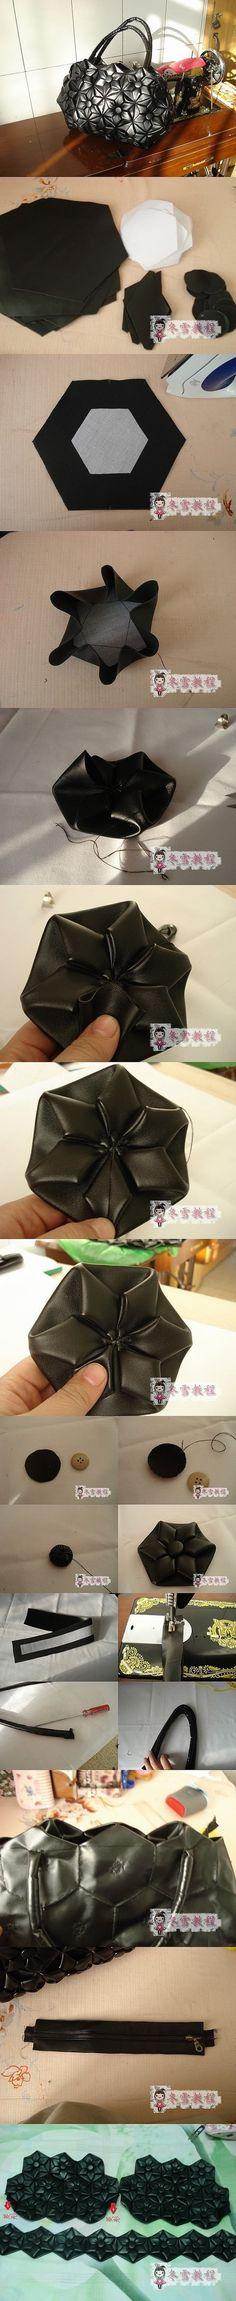 origamitas. Looks intriguing...